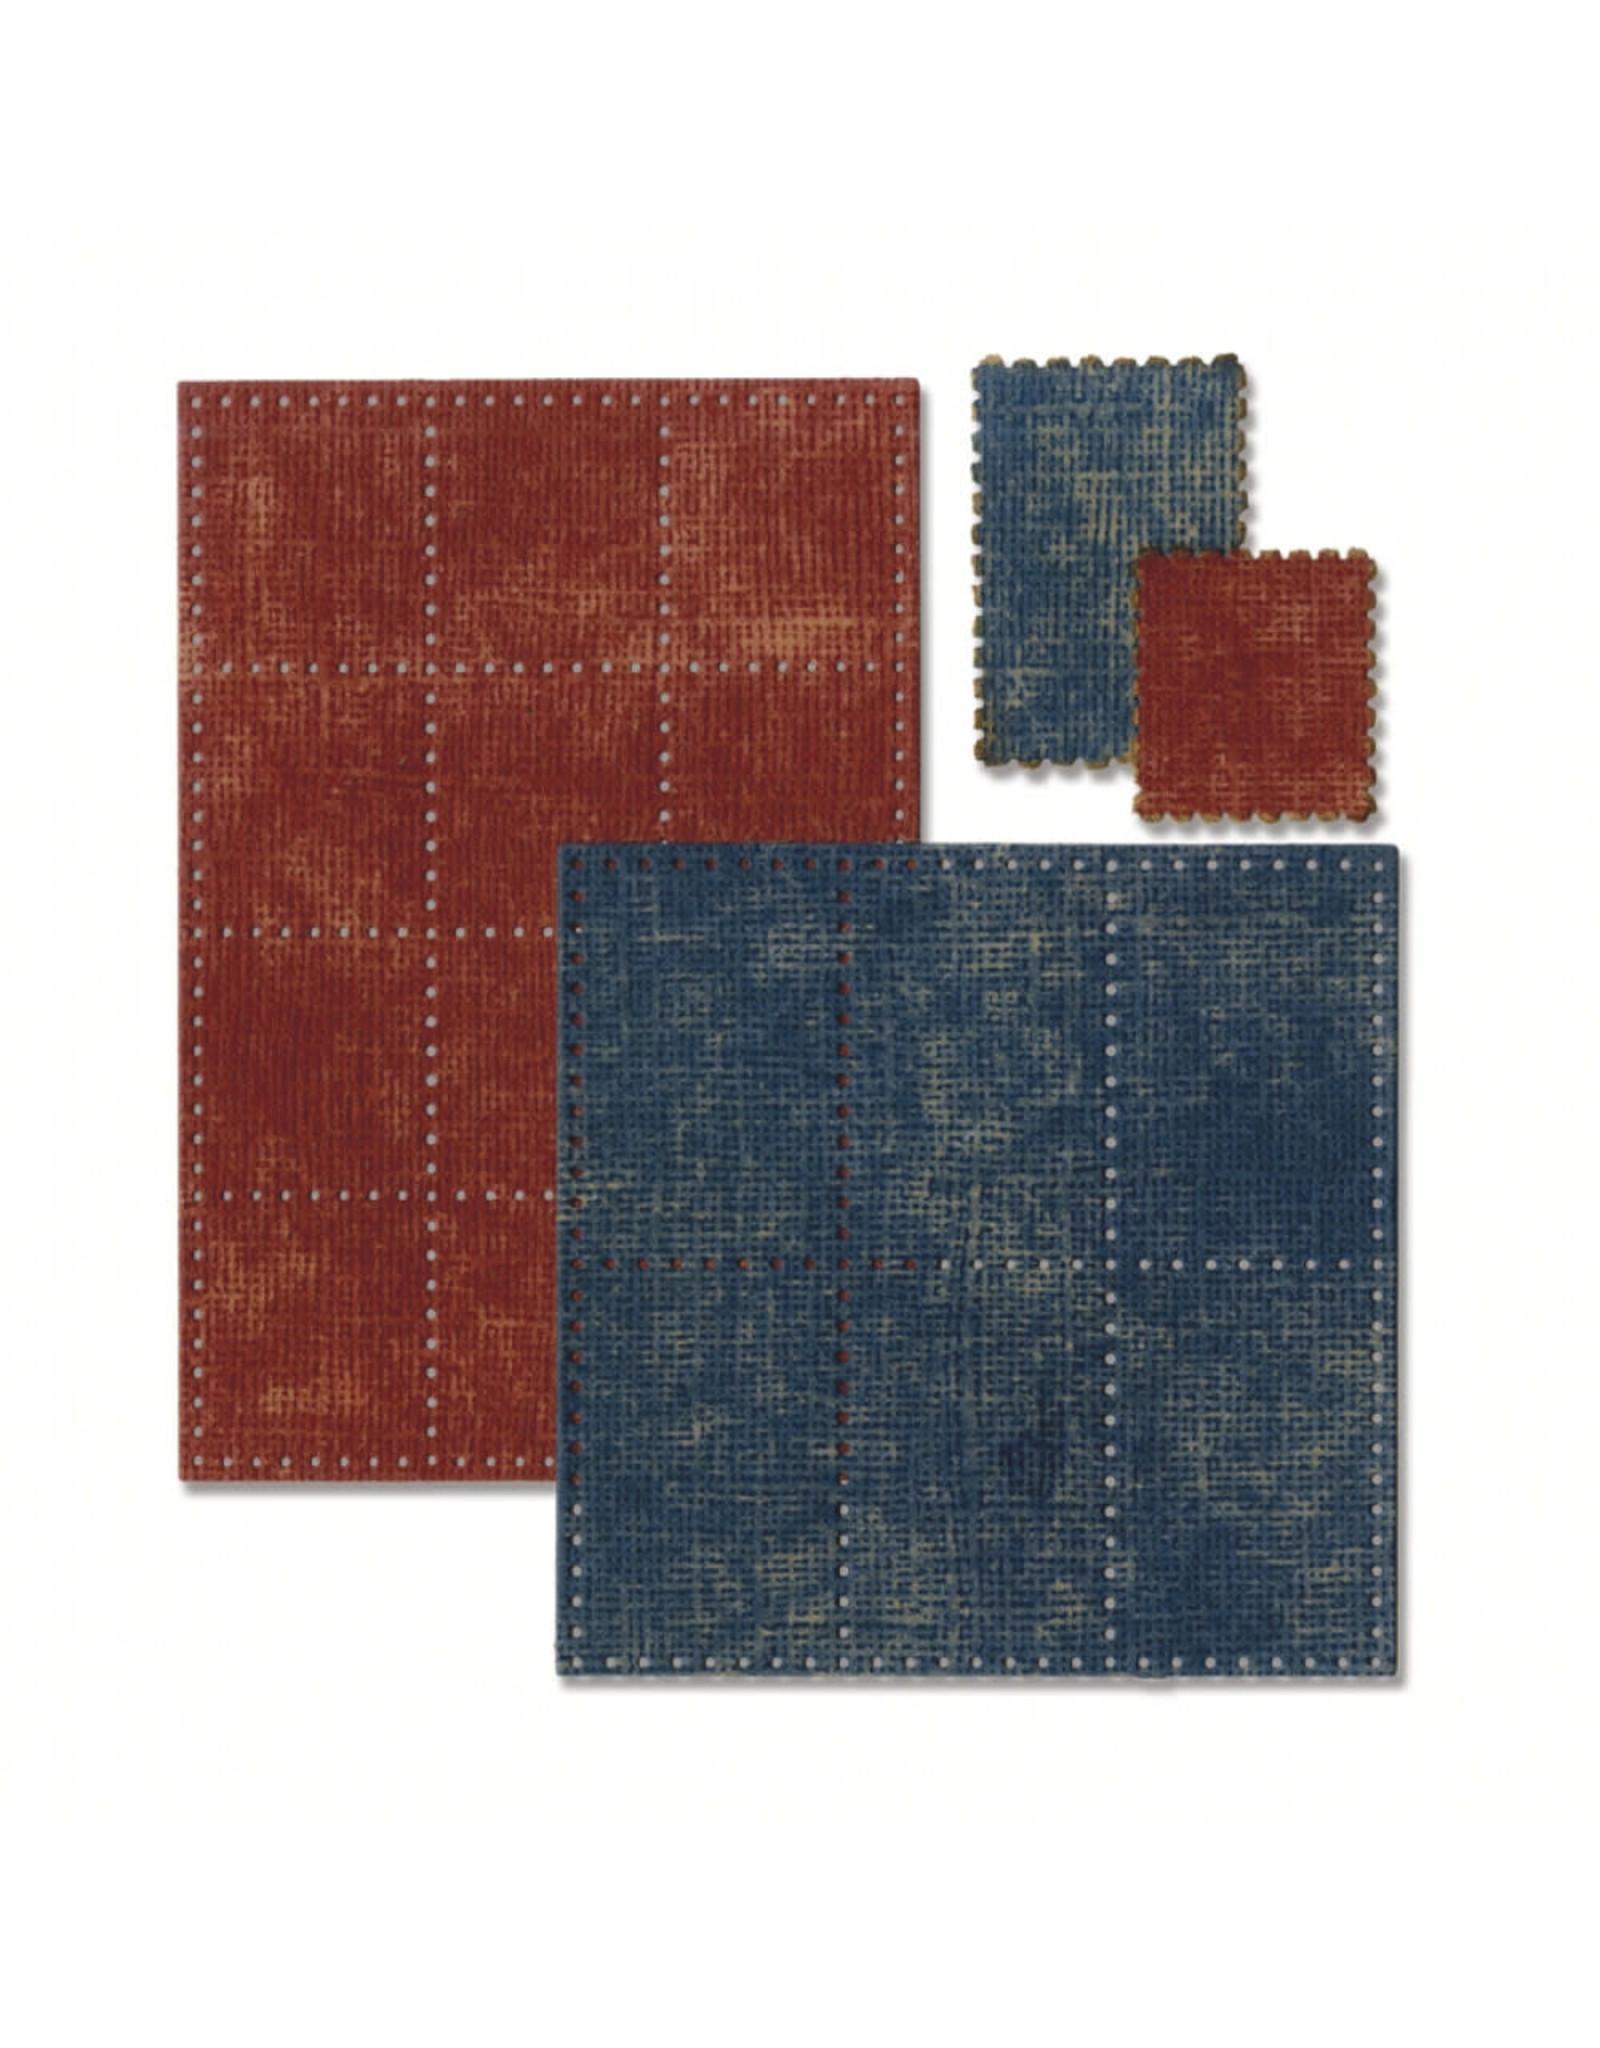 Ellison/Sizzix Postage - Thinlits (RETIRED) (25%)